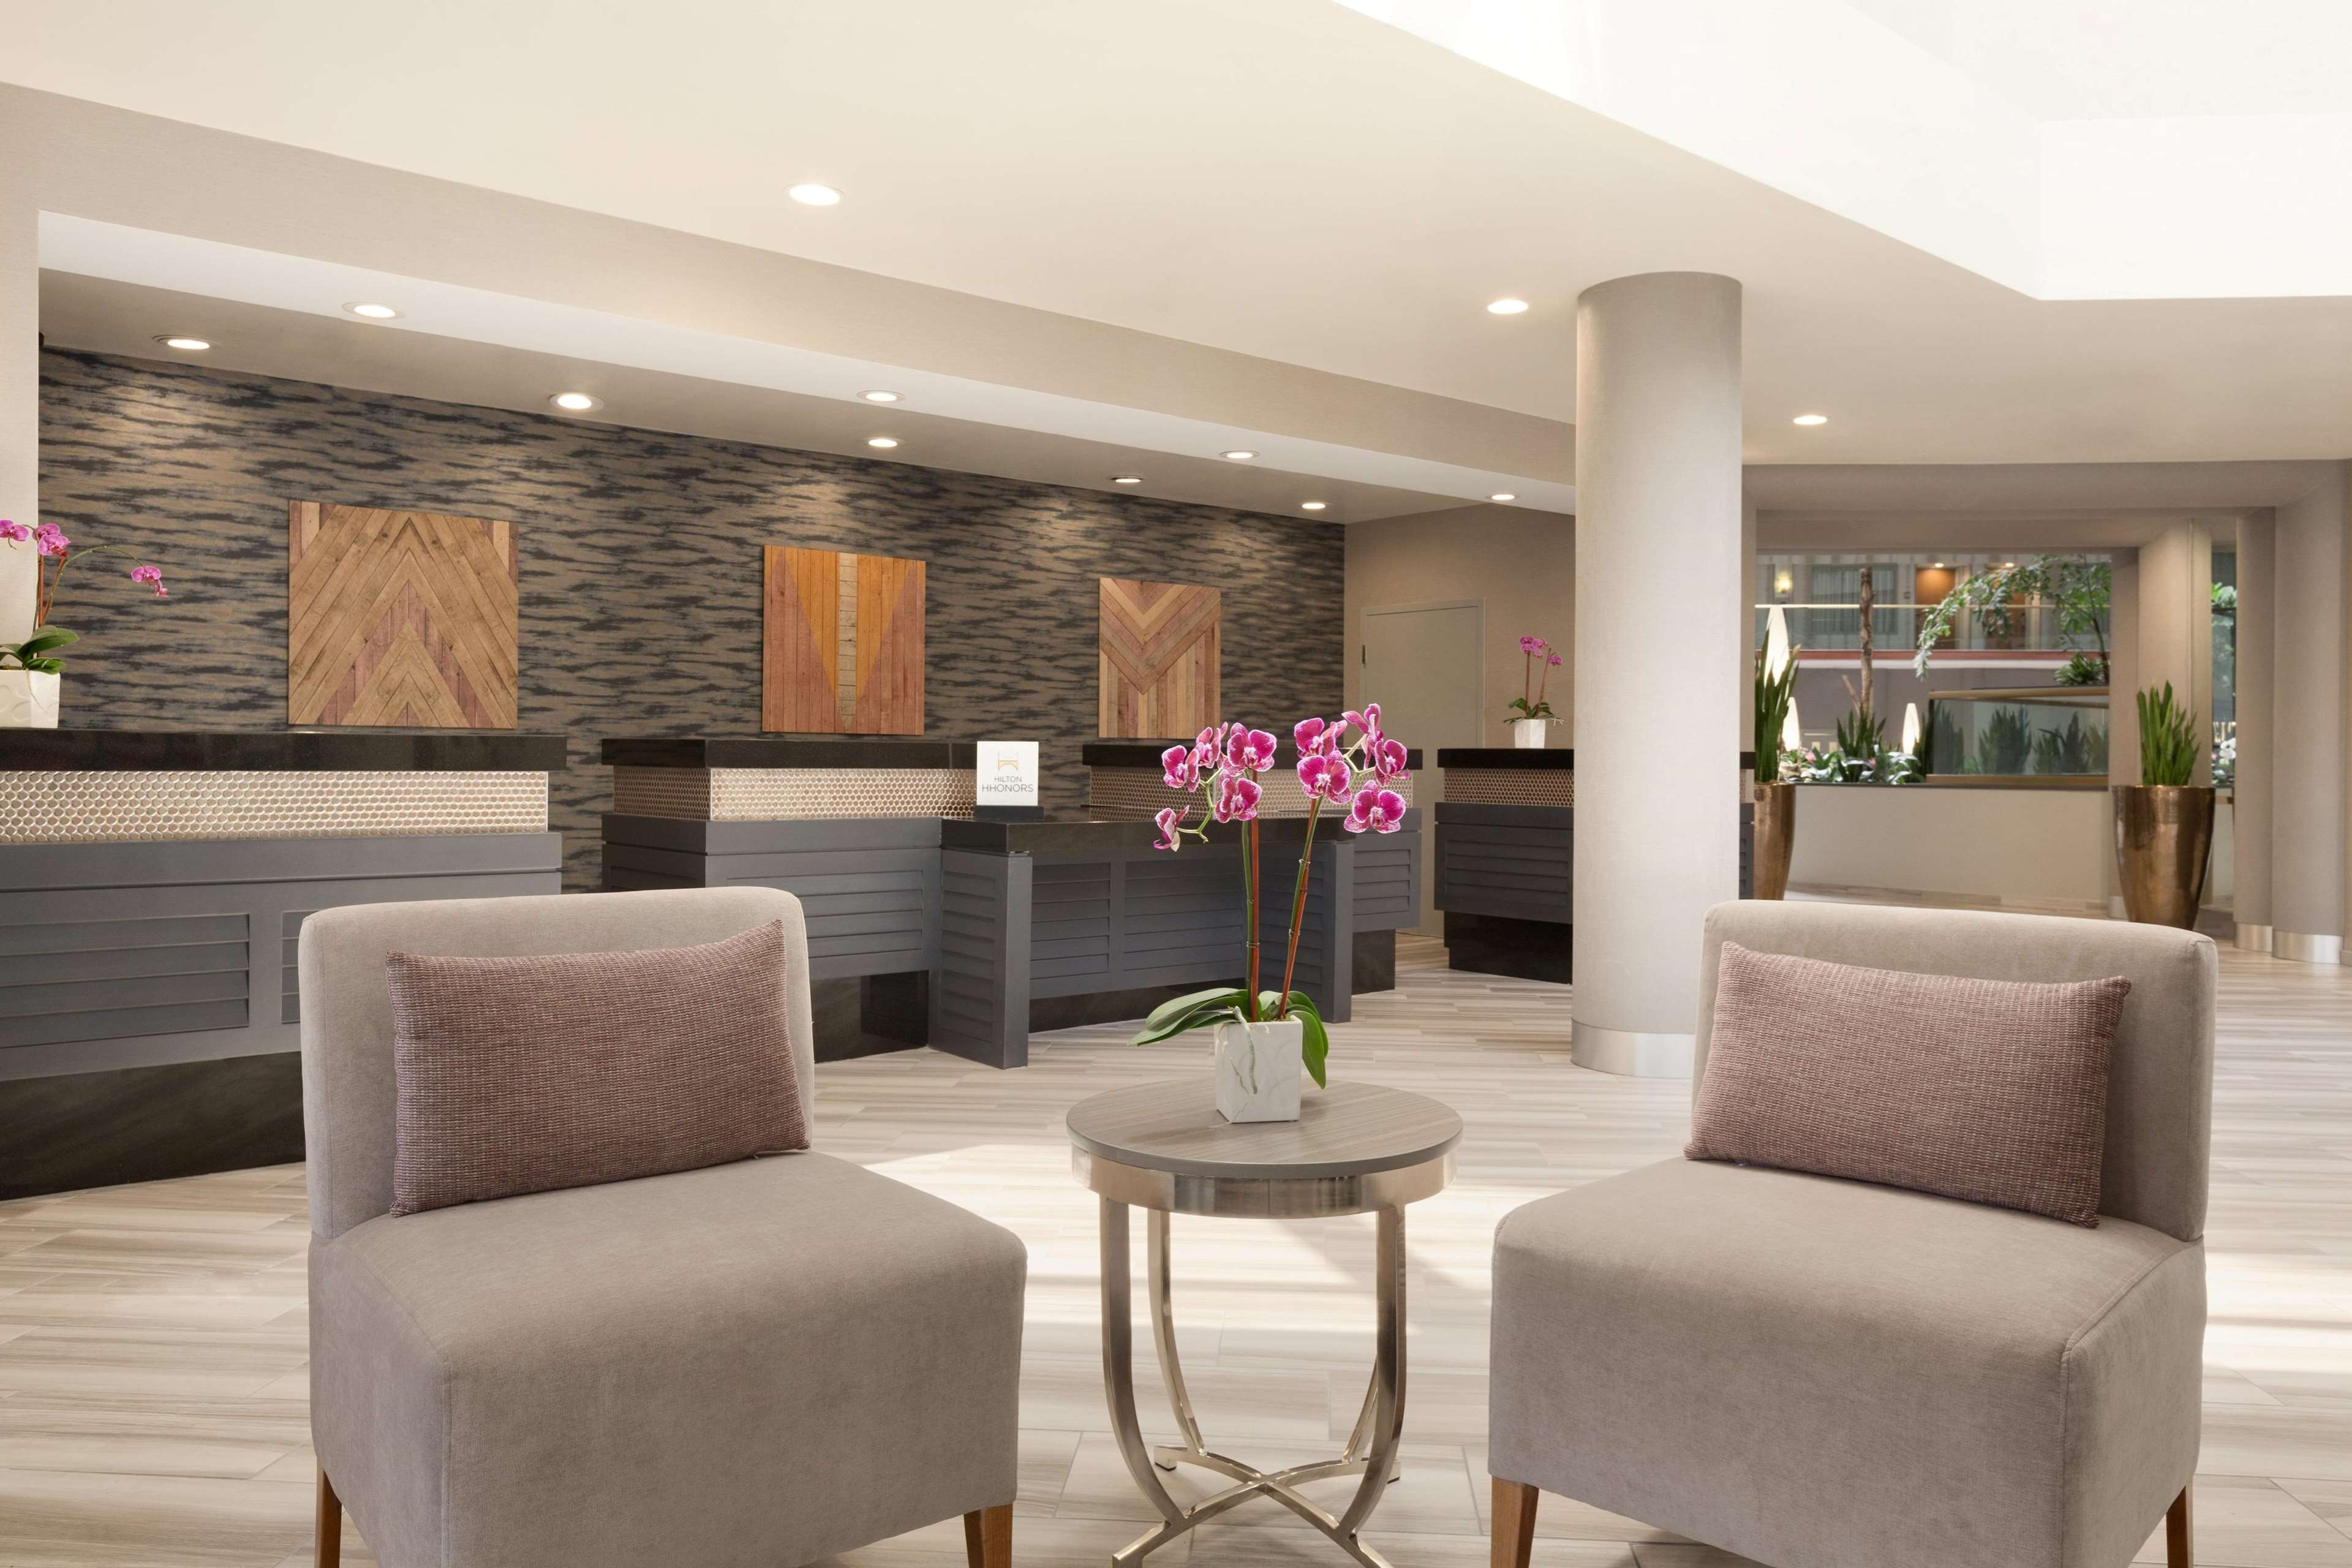 Embassy Suites Hotel Irvine Lobby